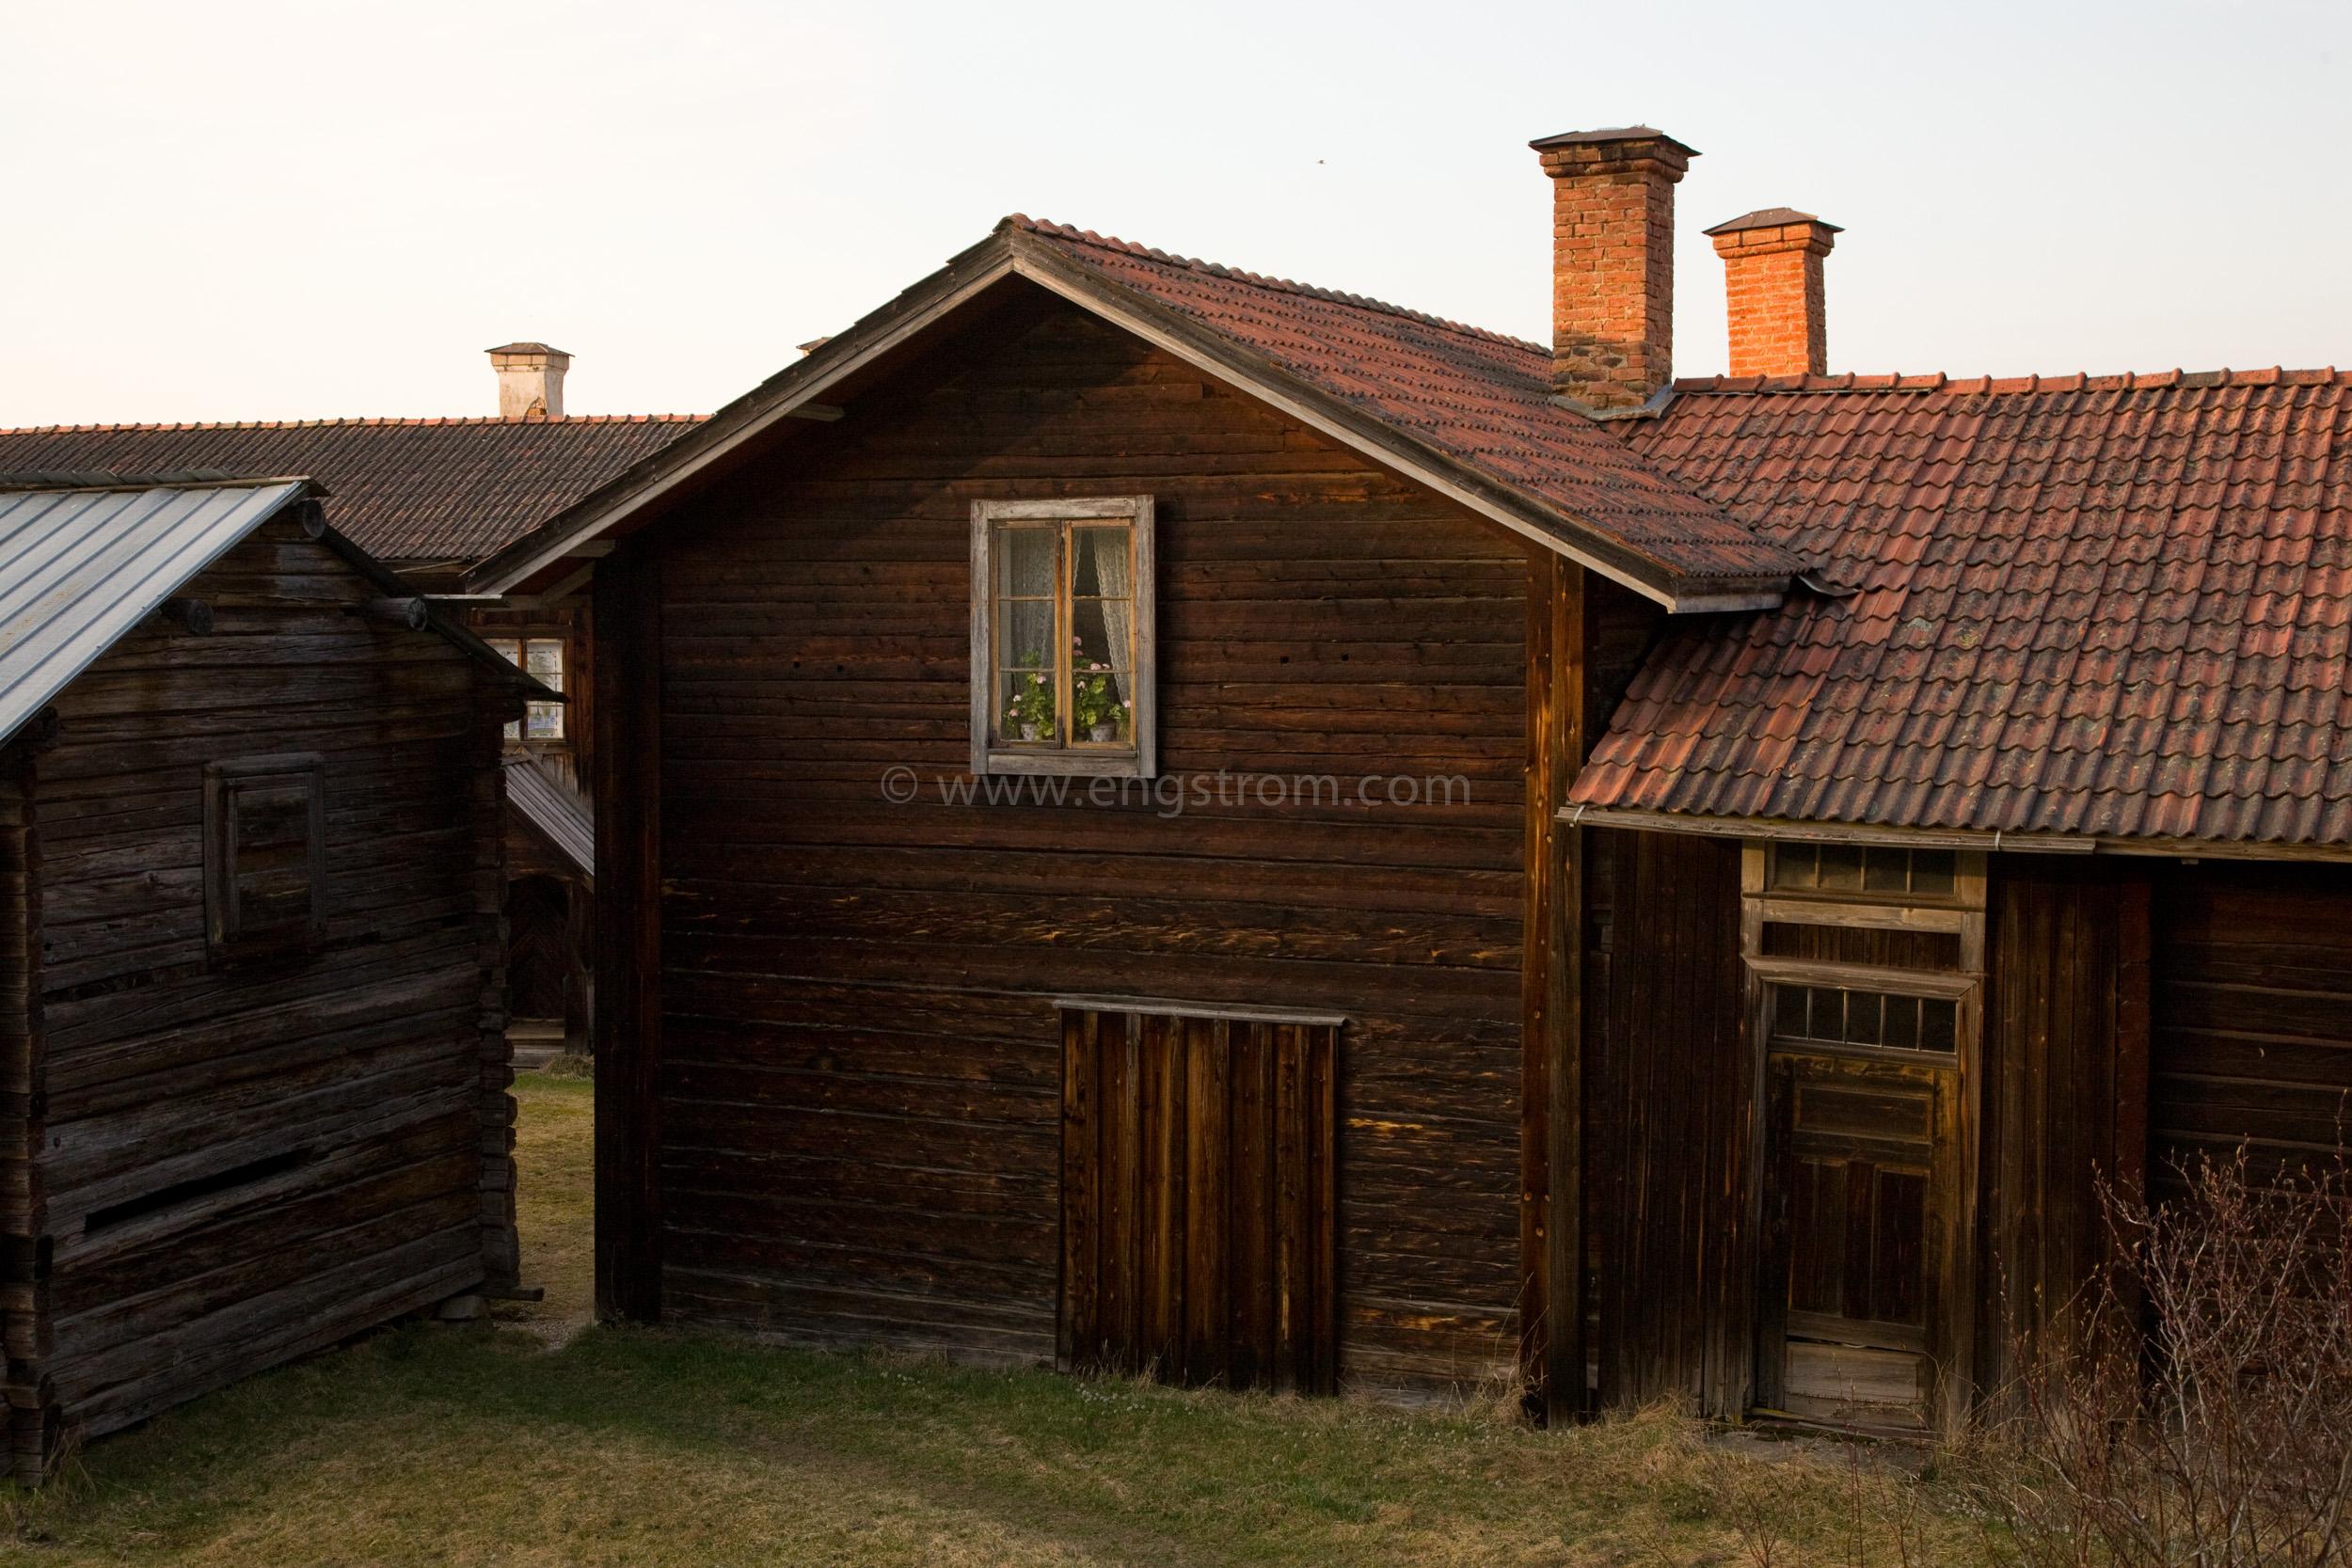 JE_62006, Solbränt, Jonas Engström